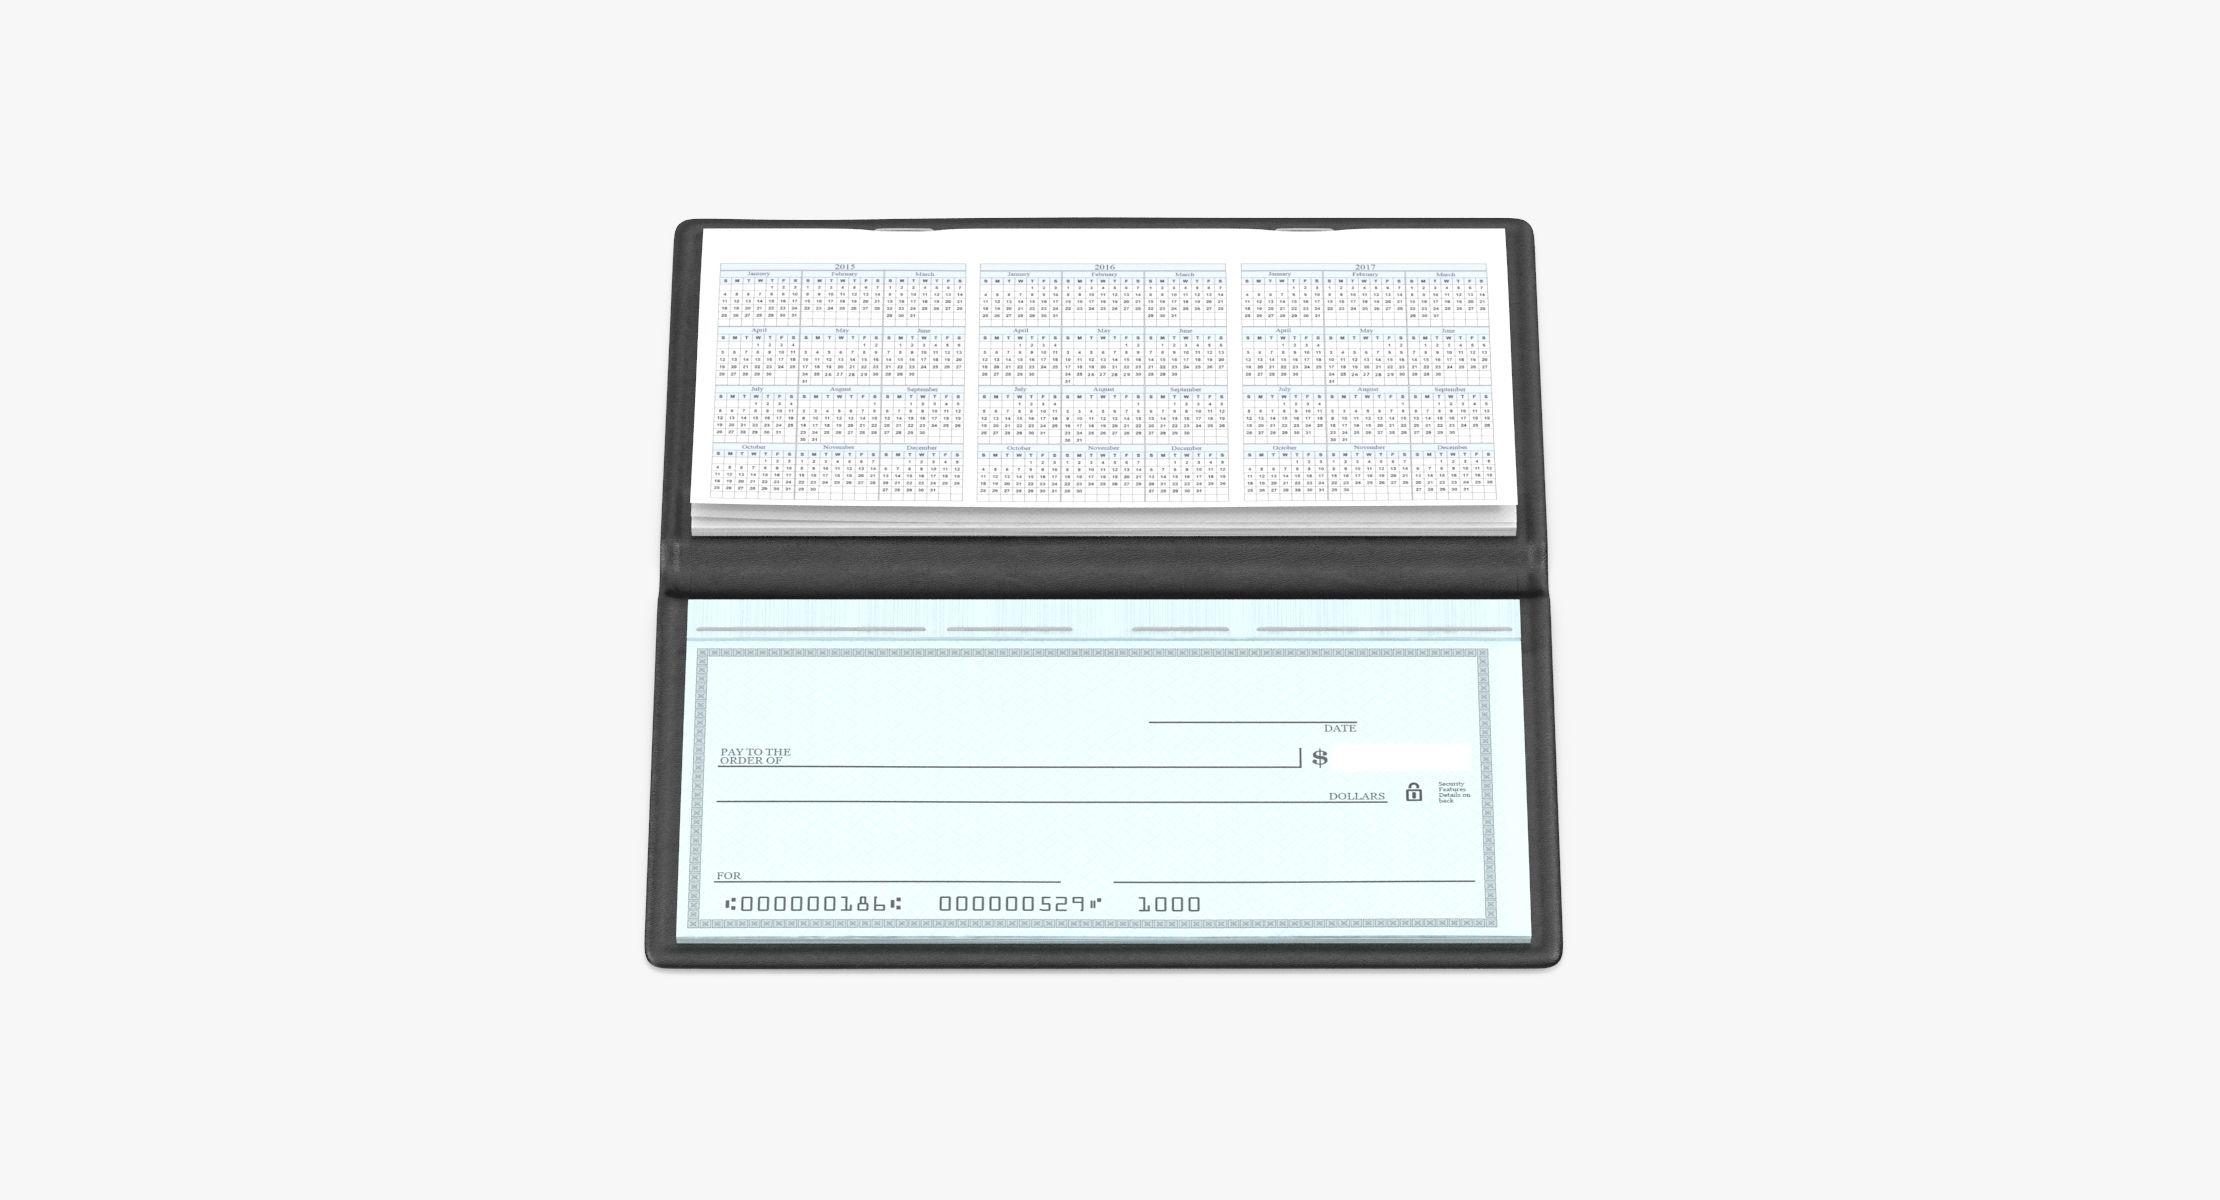 Checkbook - reel 1